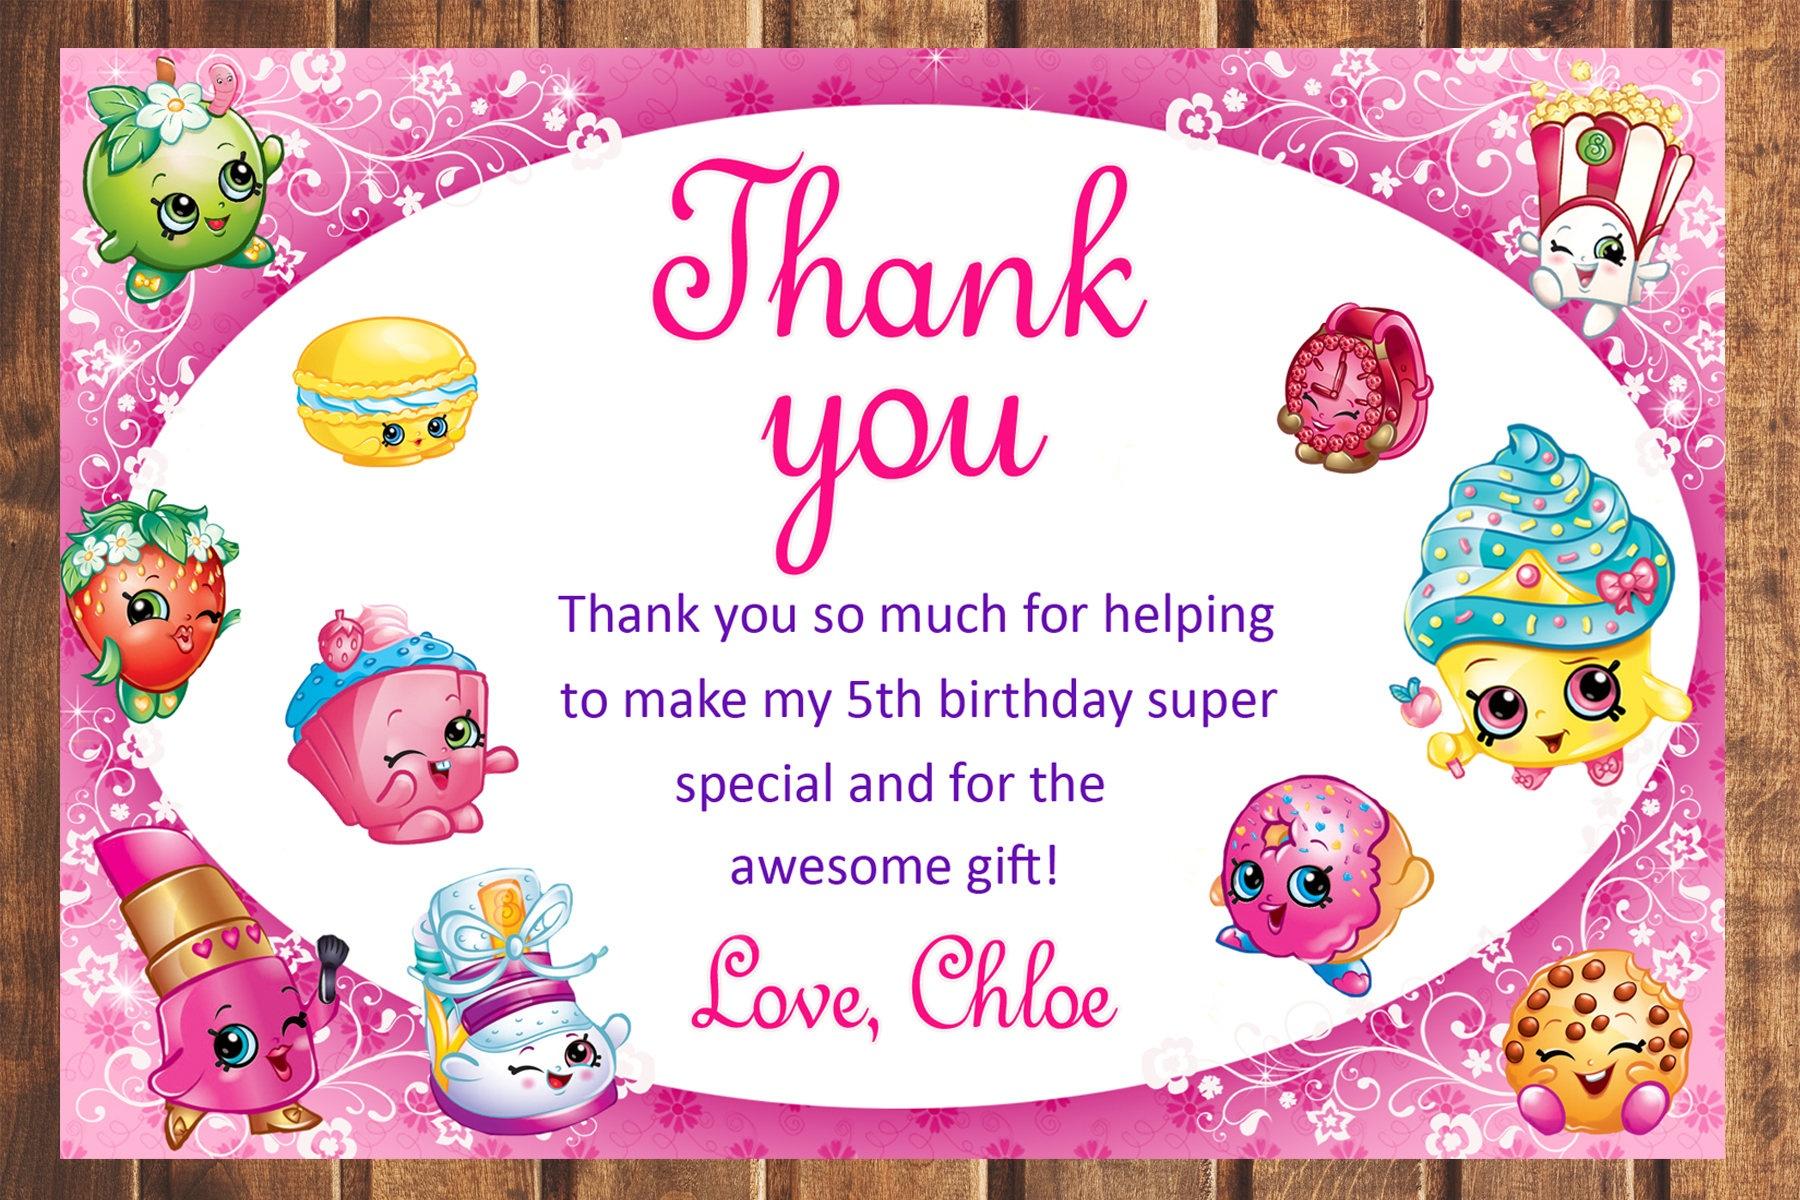 Shopkins Thank You Card Shopkins Birthday Card Shopkins | Etsy - Shopkins Thank You Cards Free Printable